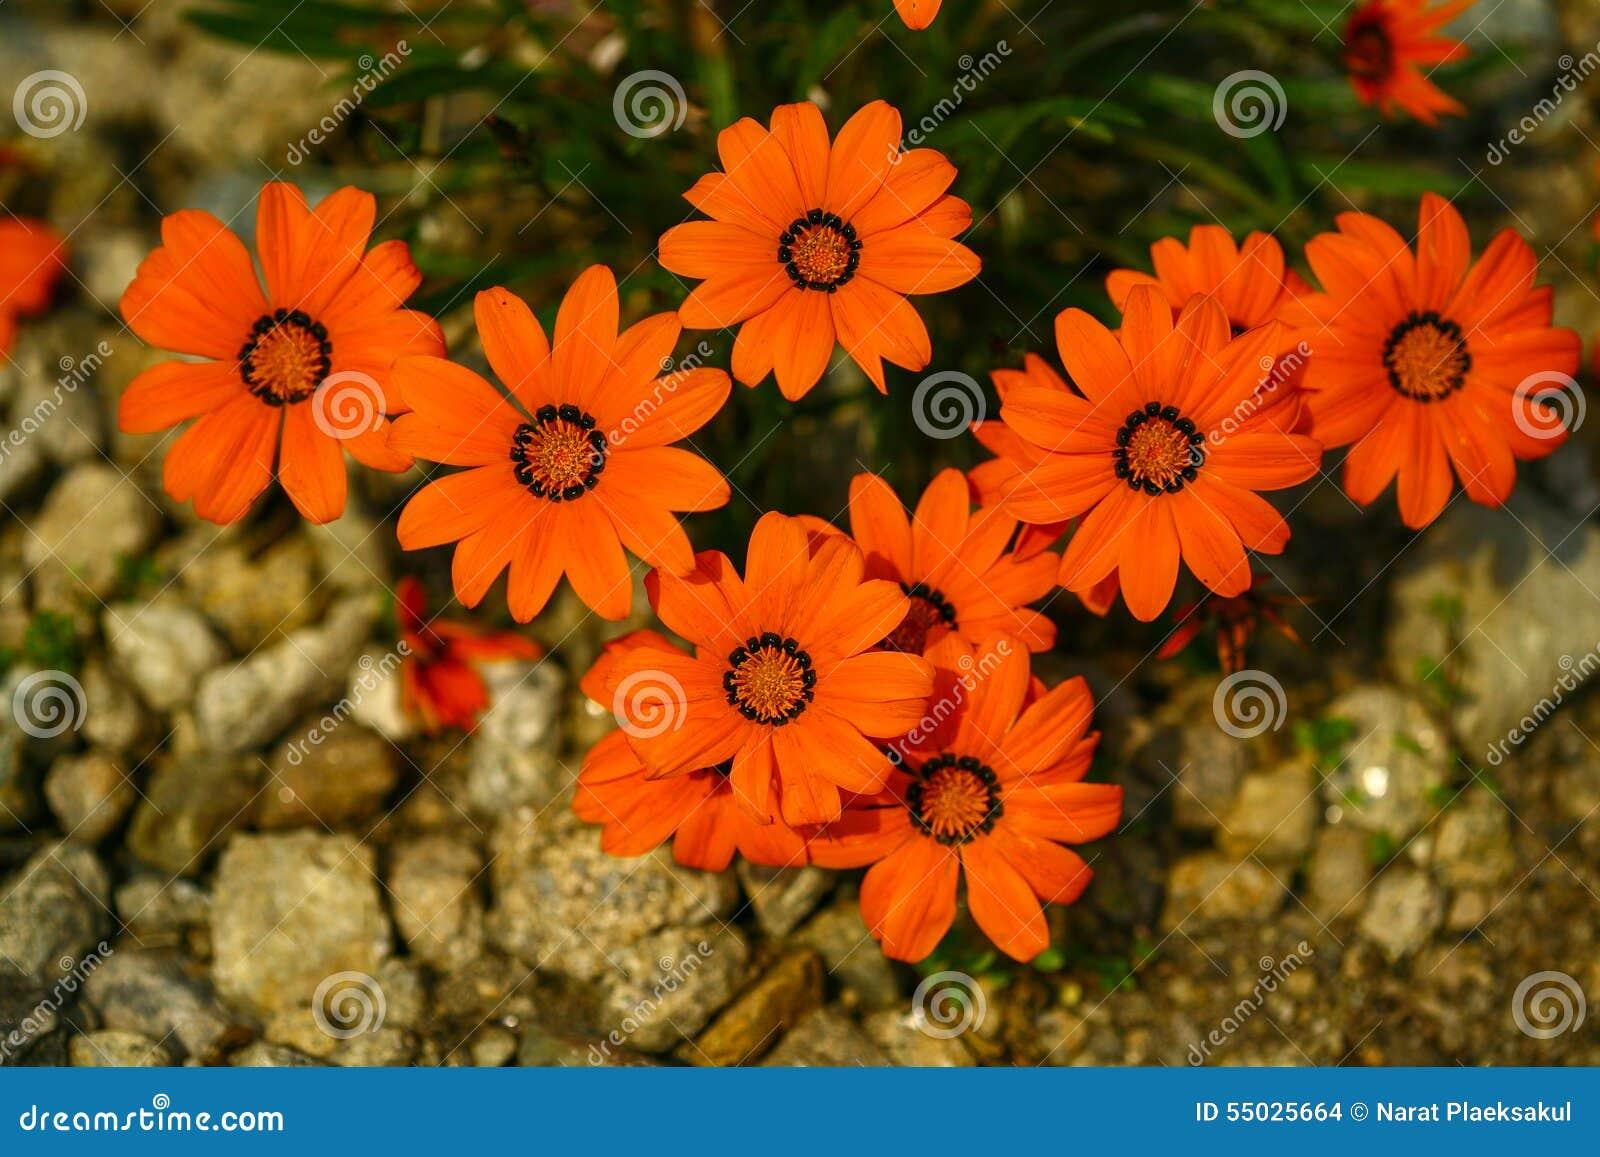 Ursinia Bright Orange Beautiful Bright Orange Daisy Like Flower